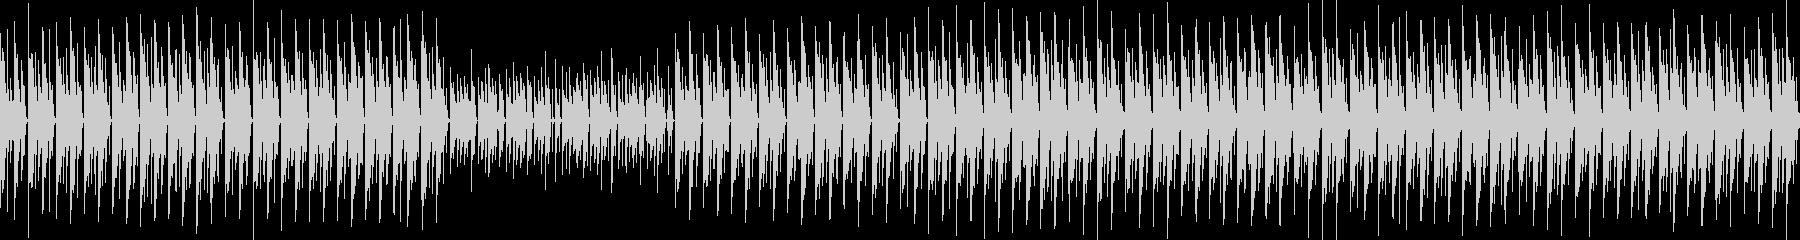 (loop)ミニゲーム風ファンシーポップの未再生の波形